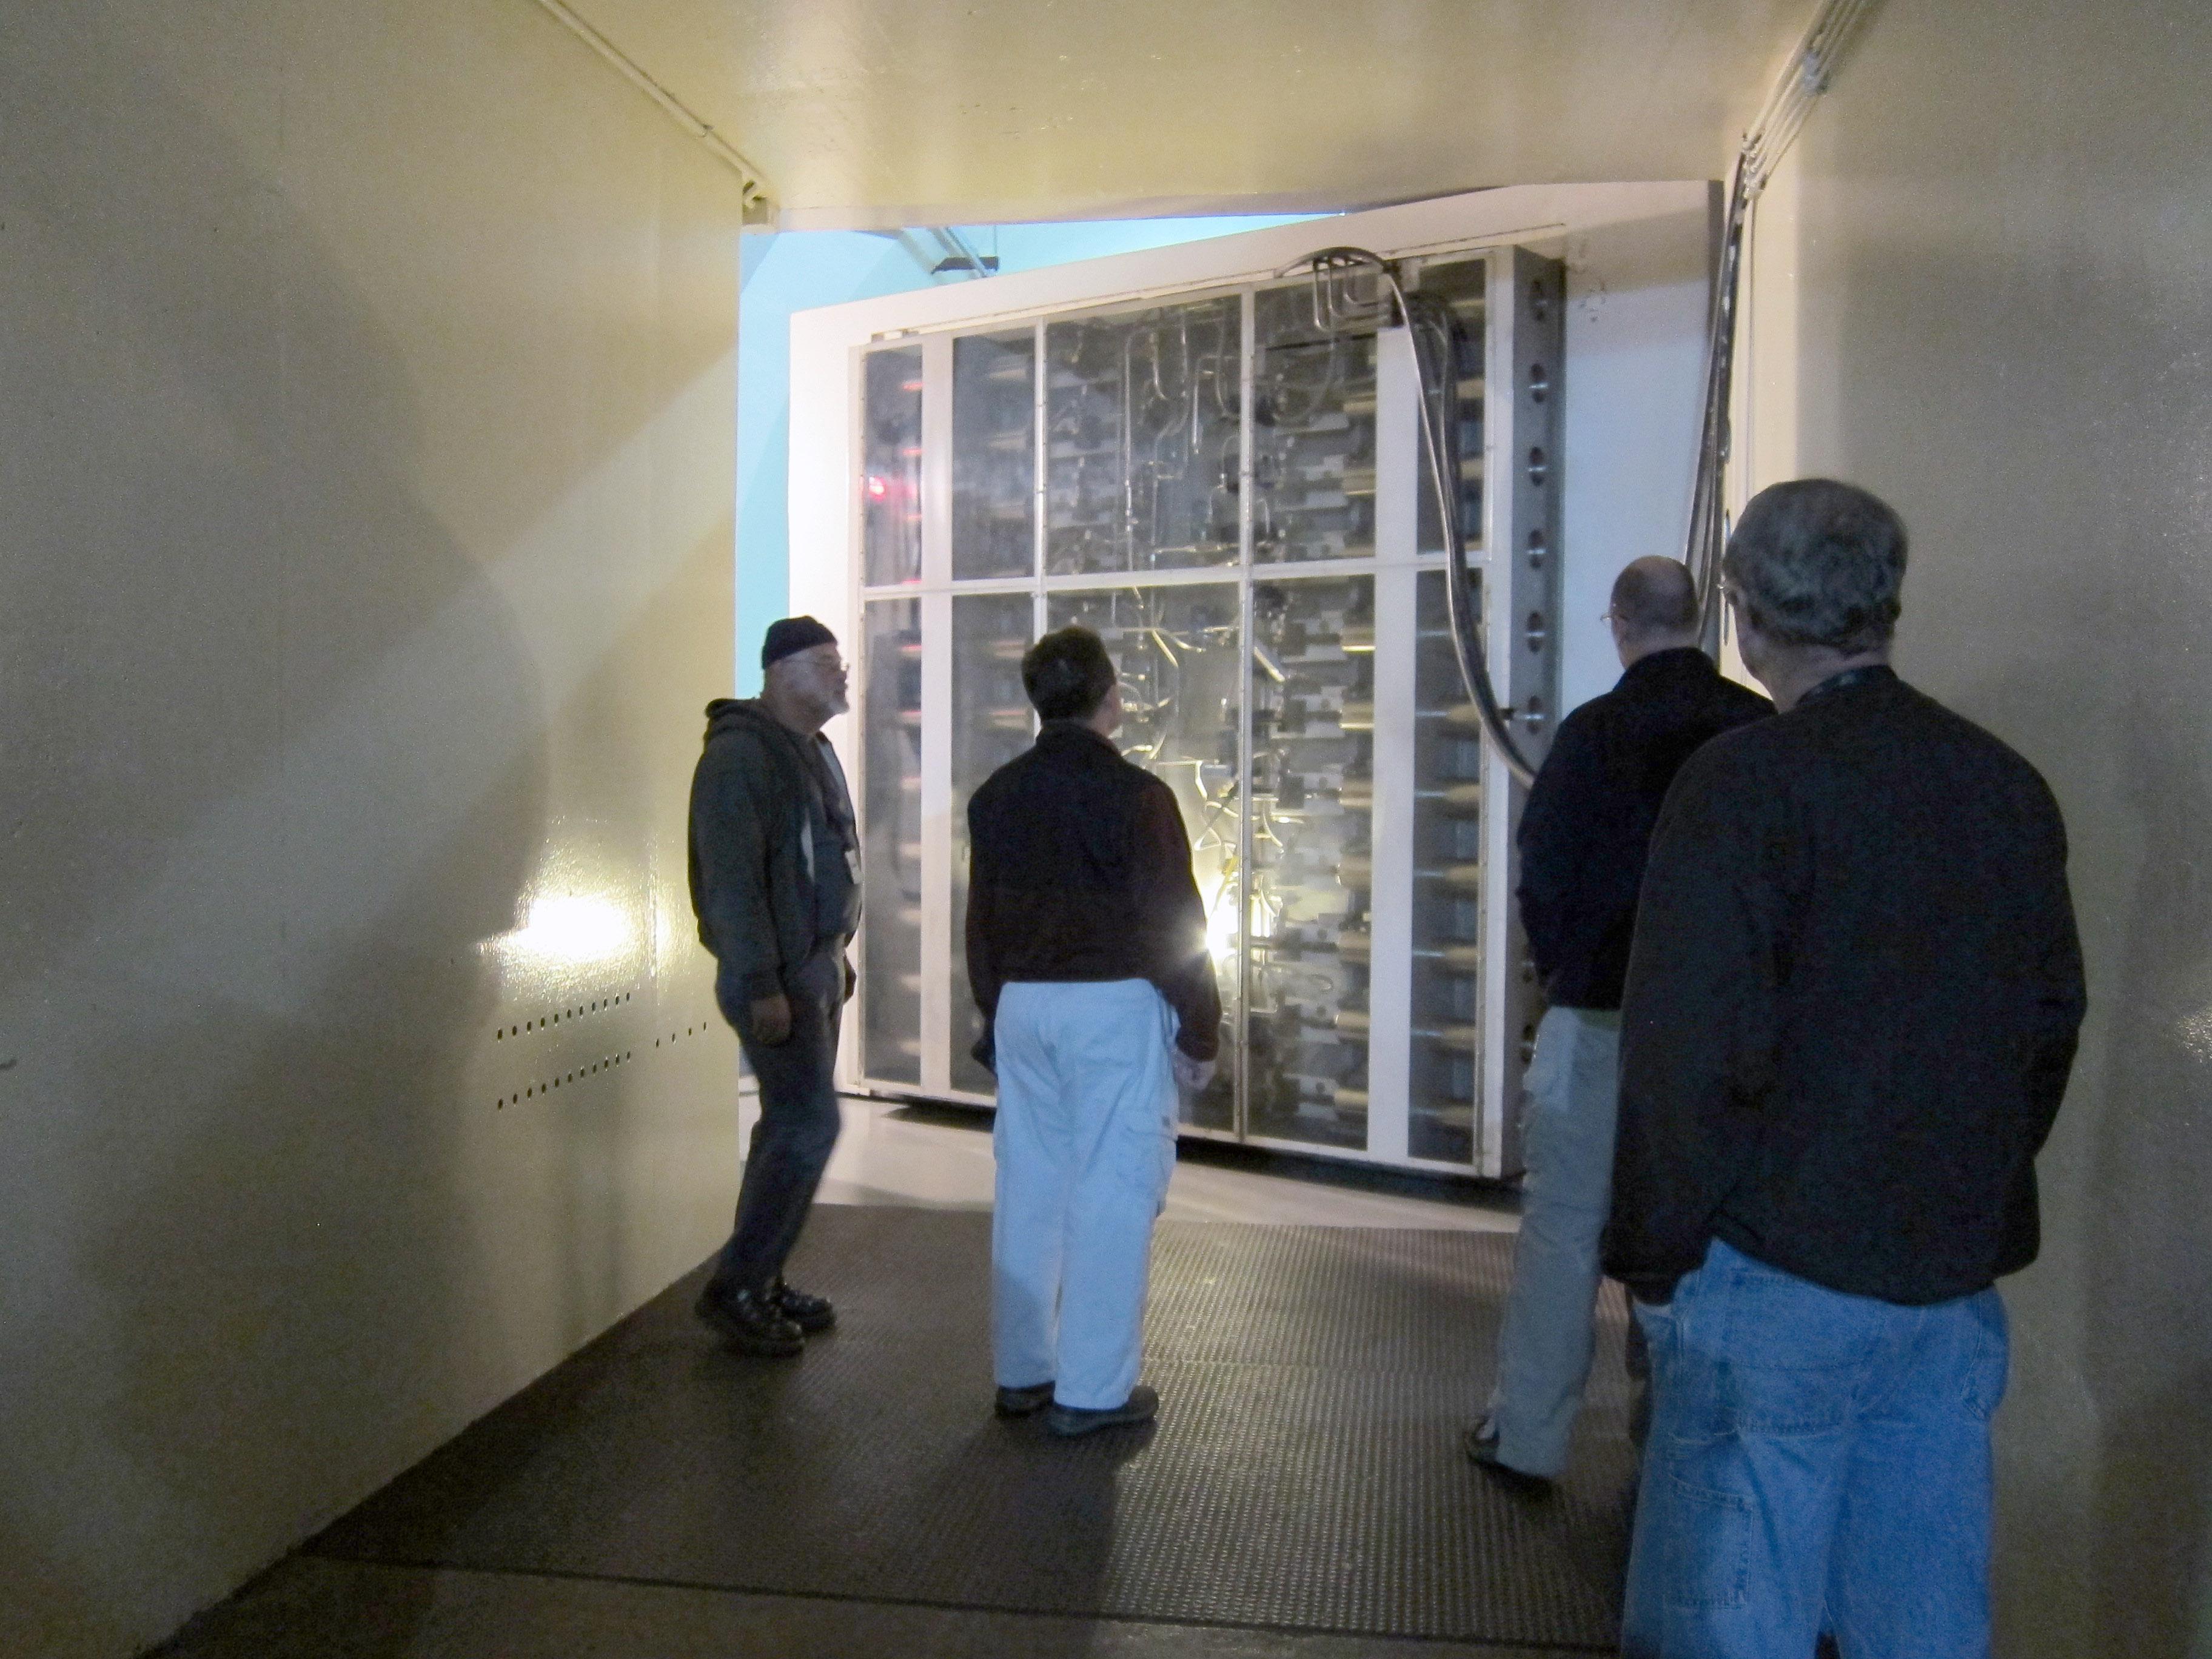 File121025-F-ZZ000-001 Cheyenne Mountain 20-ton blast door & File:121025-F-ZZ000-001 Cheyenne Mountain 20-ton blast door closing ...